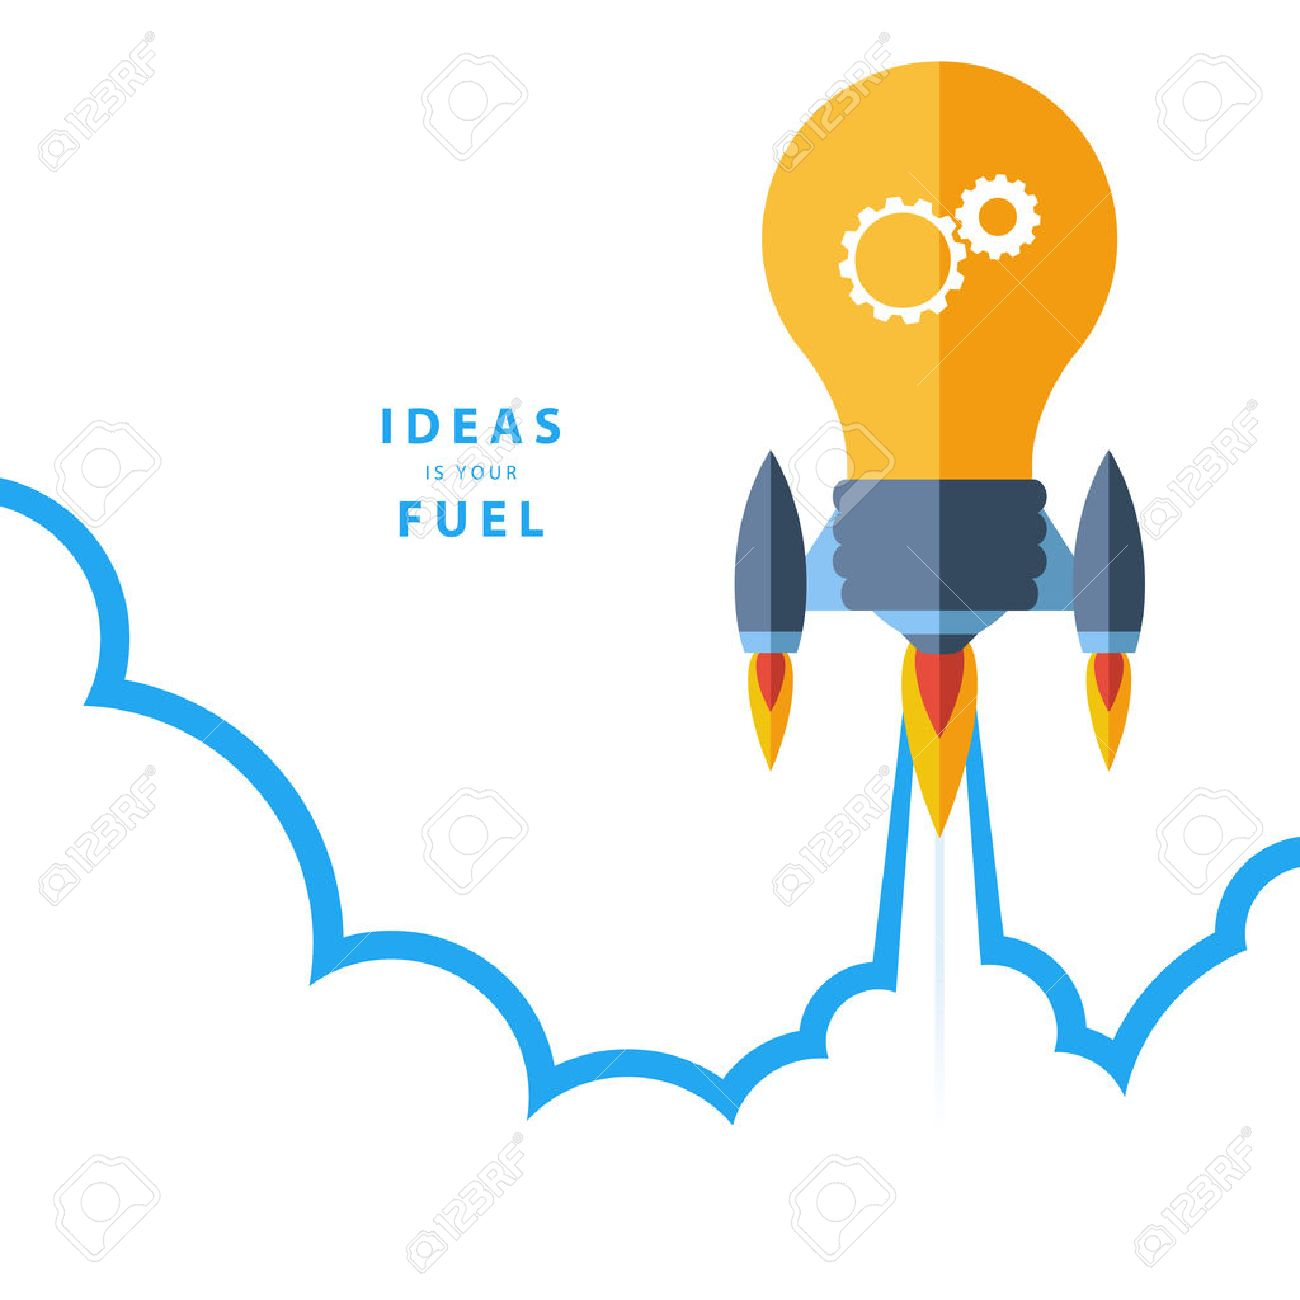 Idea Design having an idea design free vector The Big Idea Flat Design Colorful Vector Illustration Concept For Creativity Big Idea Creative Work